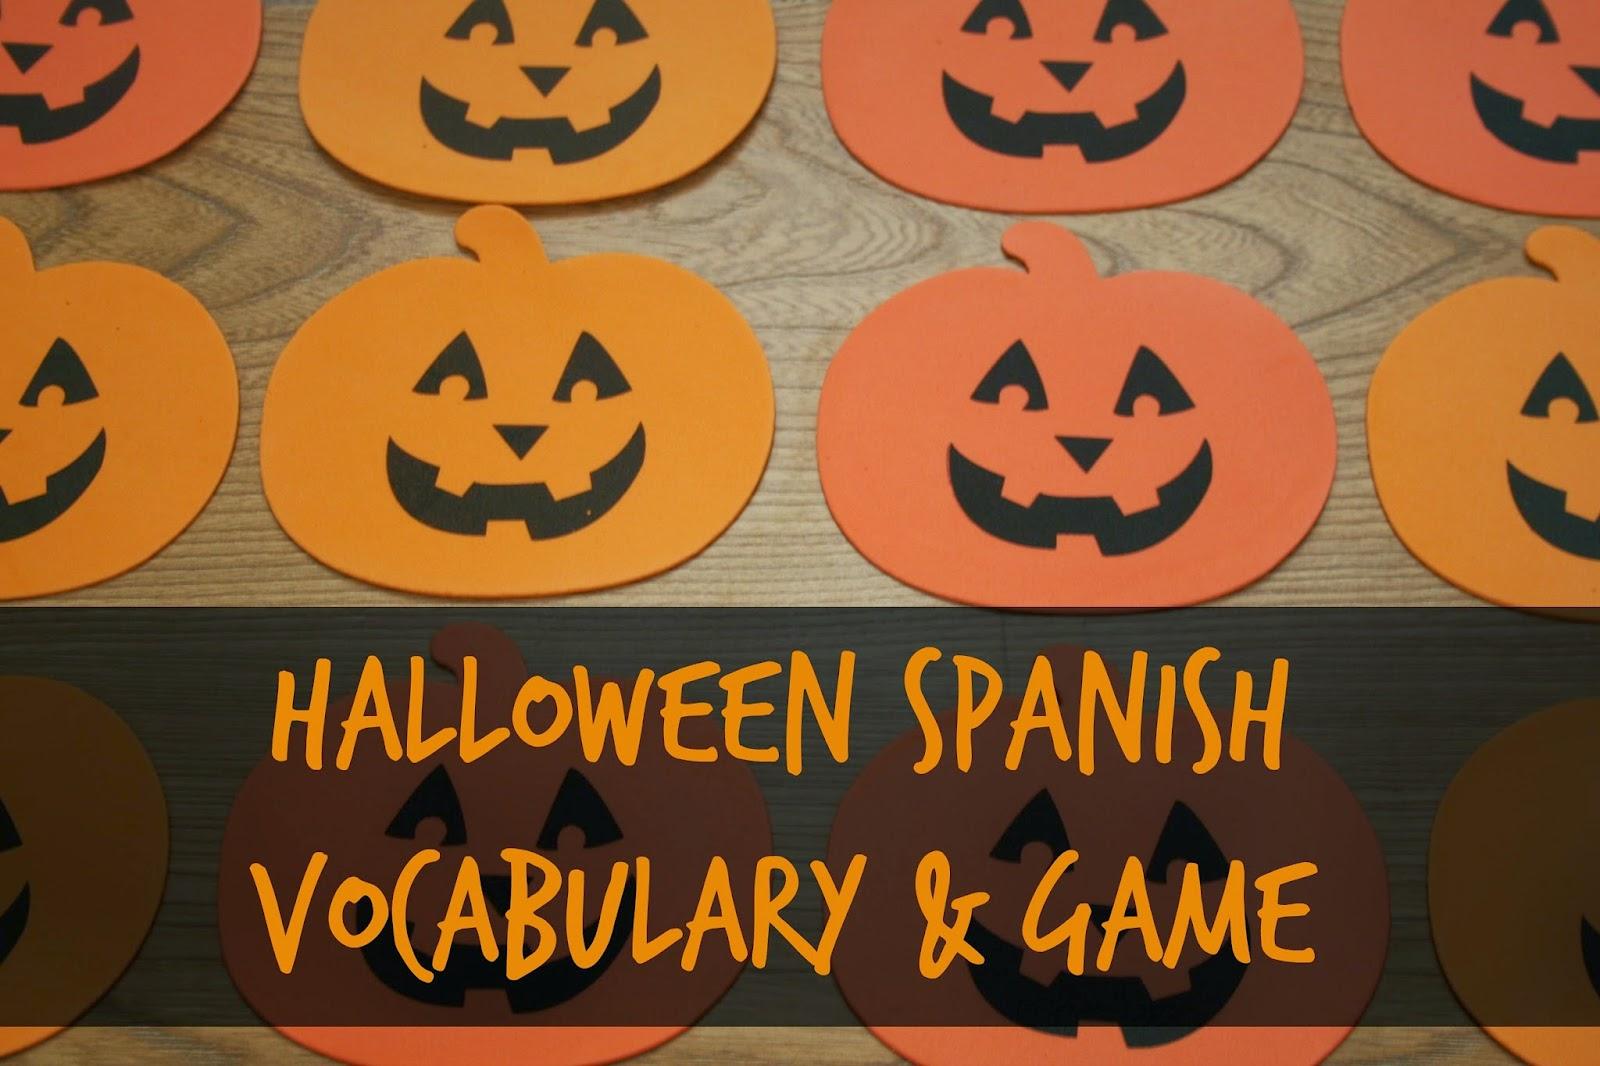 For the Love of Spanish: Halloween Spanish Vocab Practice